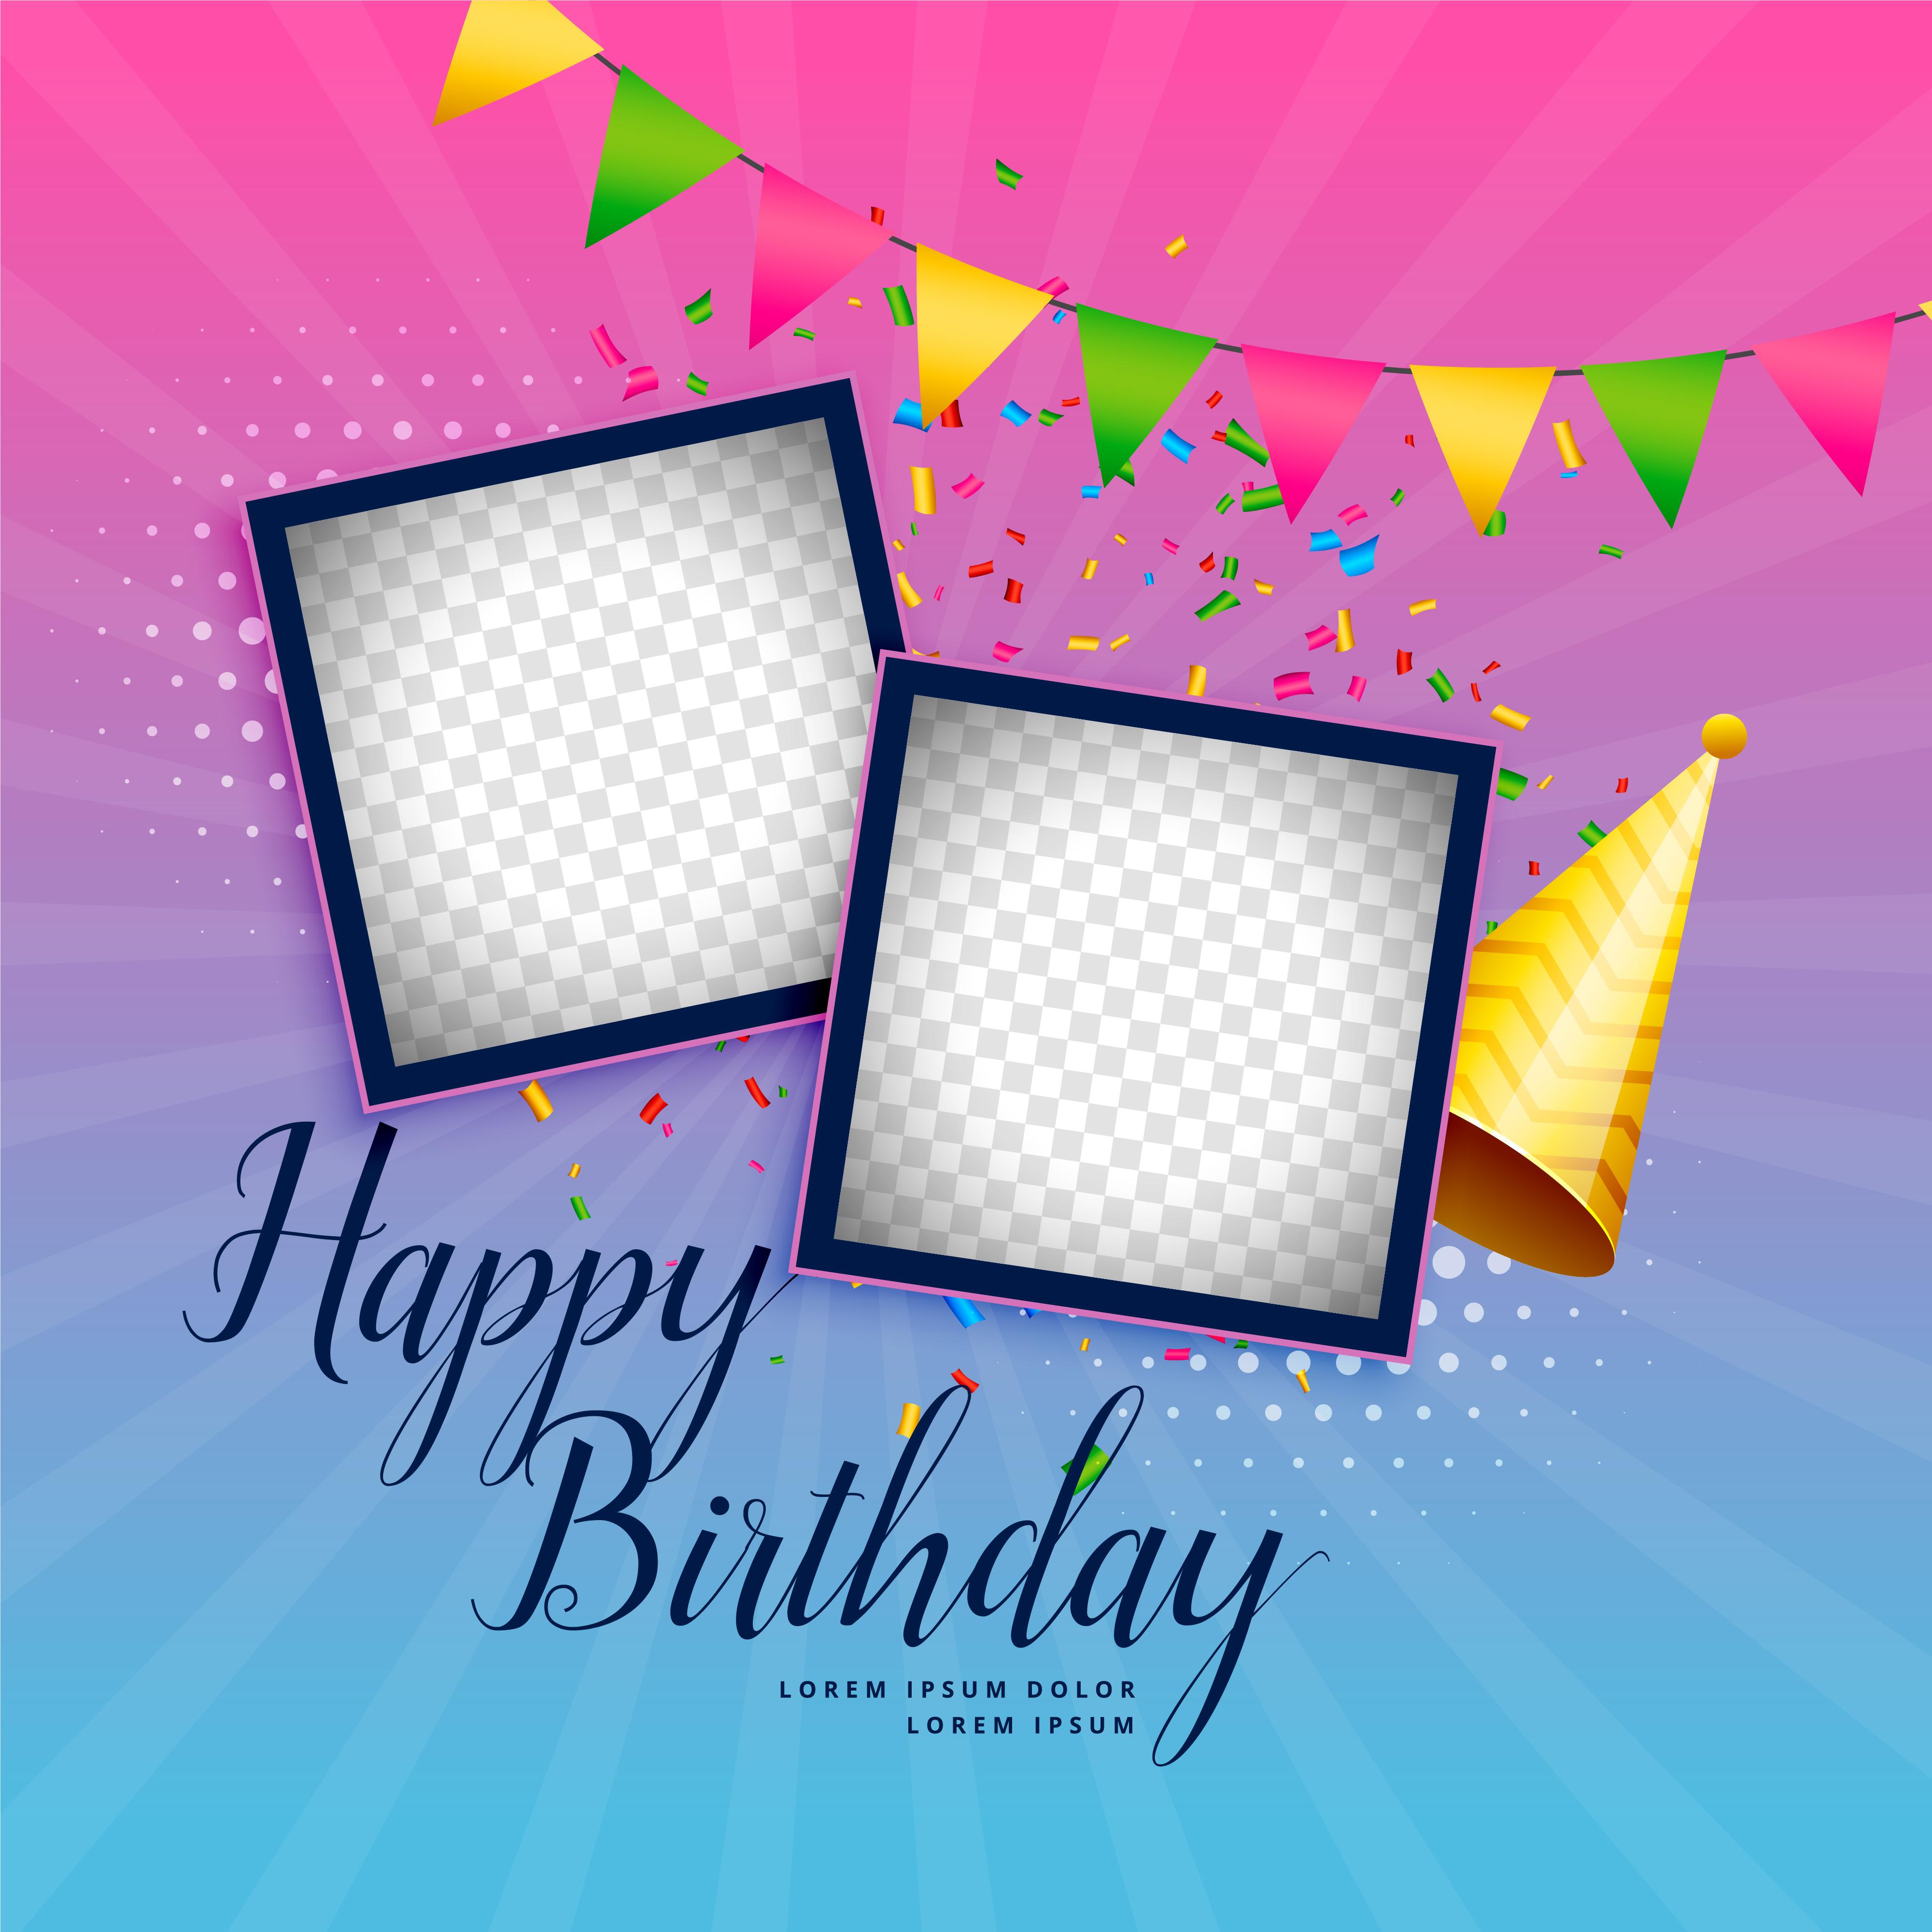 Happy Birthday Celebration Background With Photo Frame